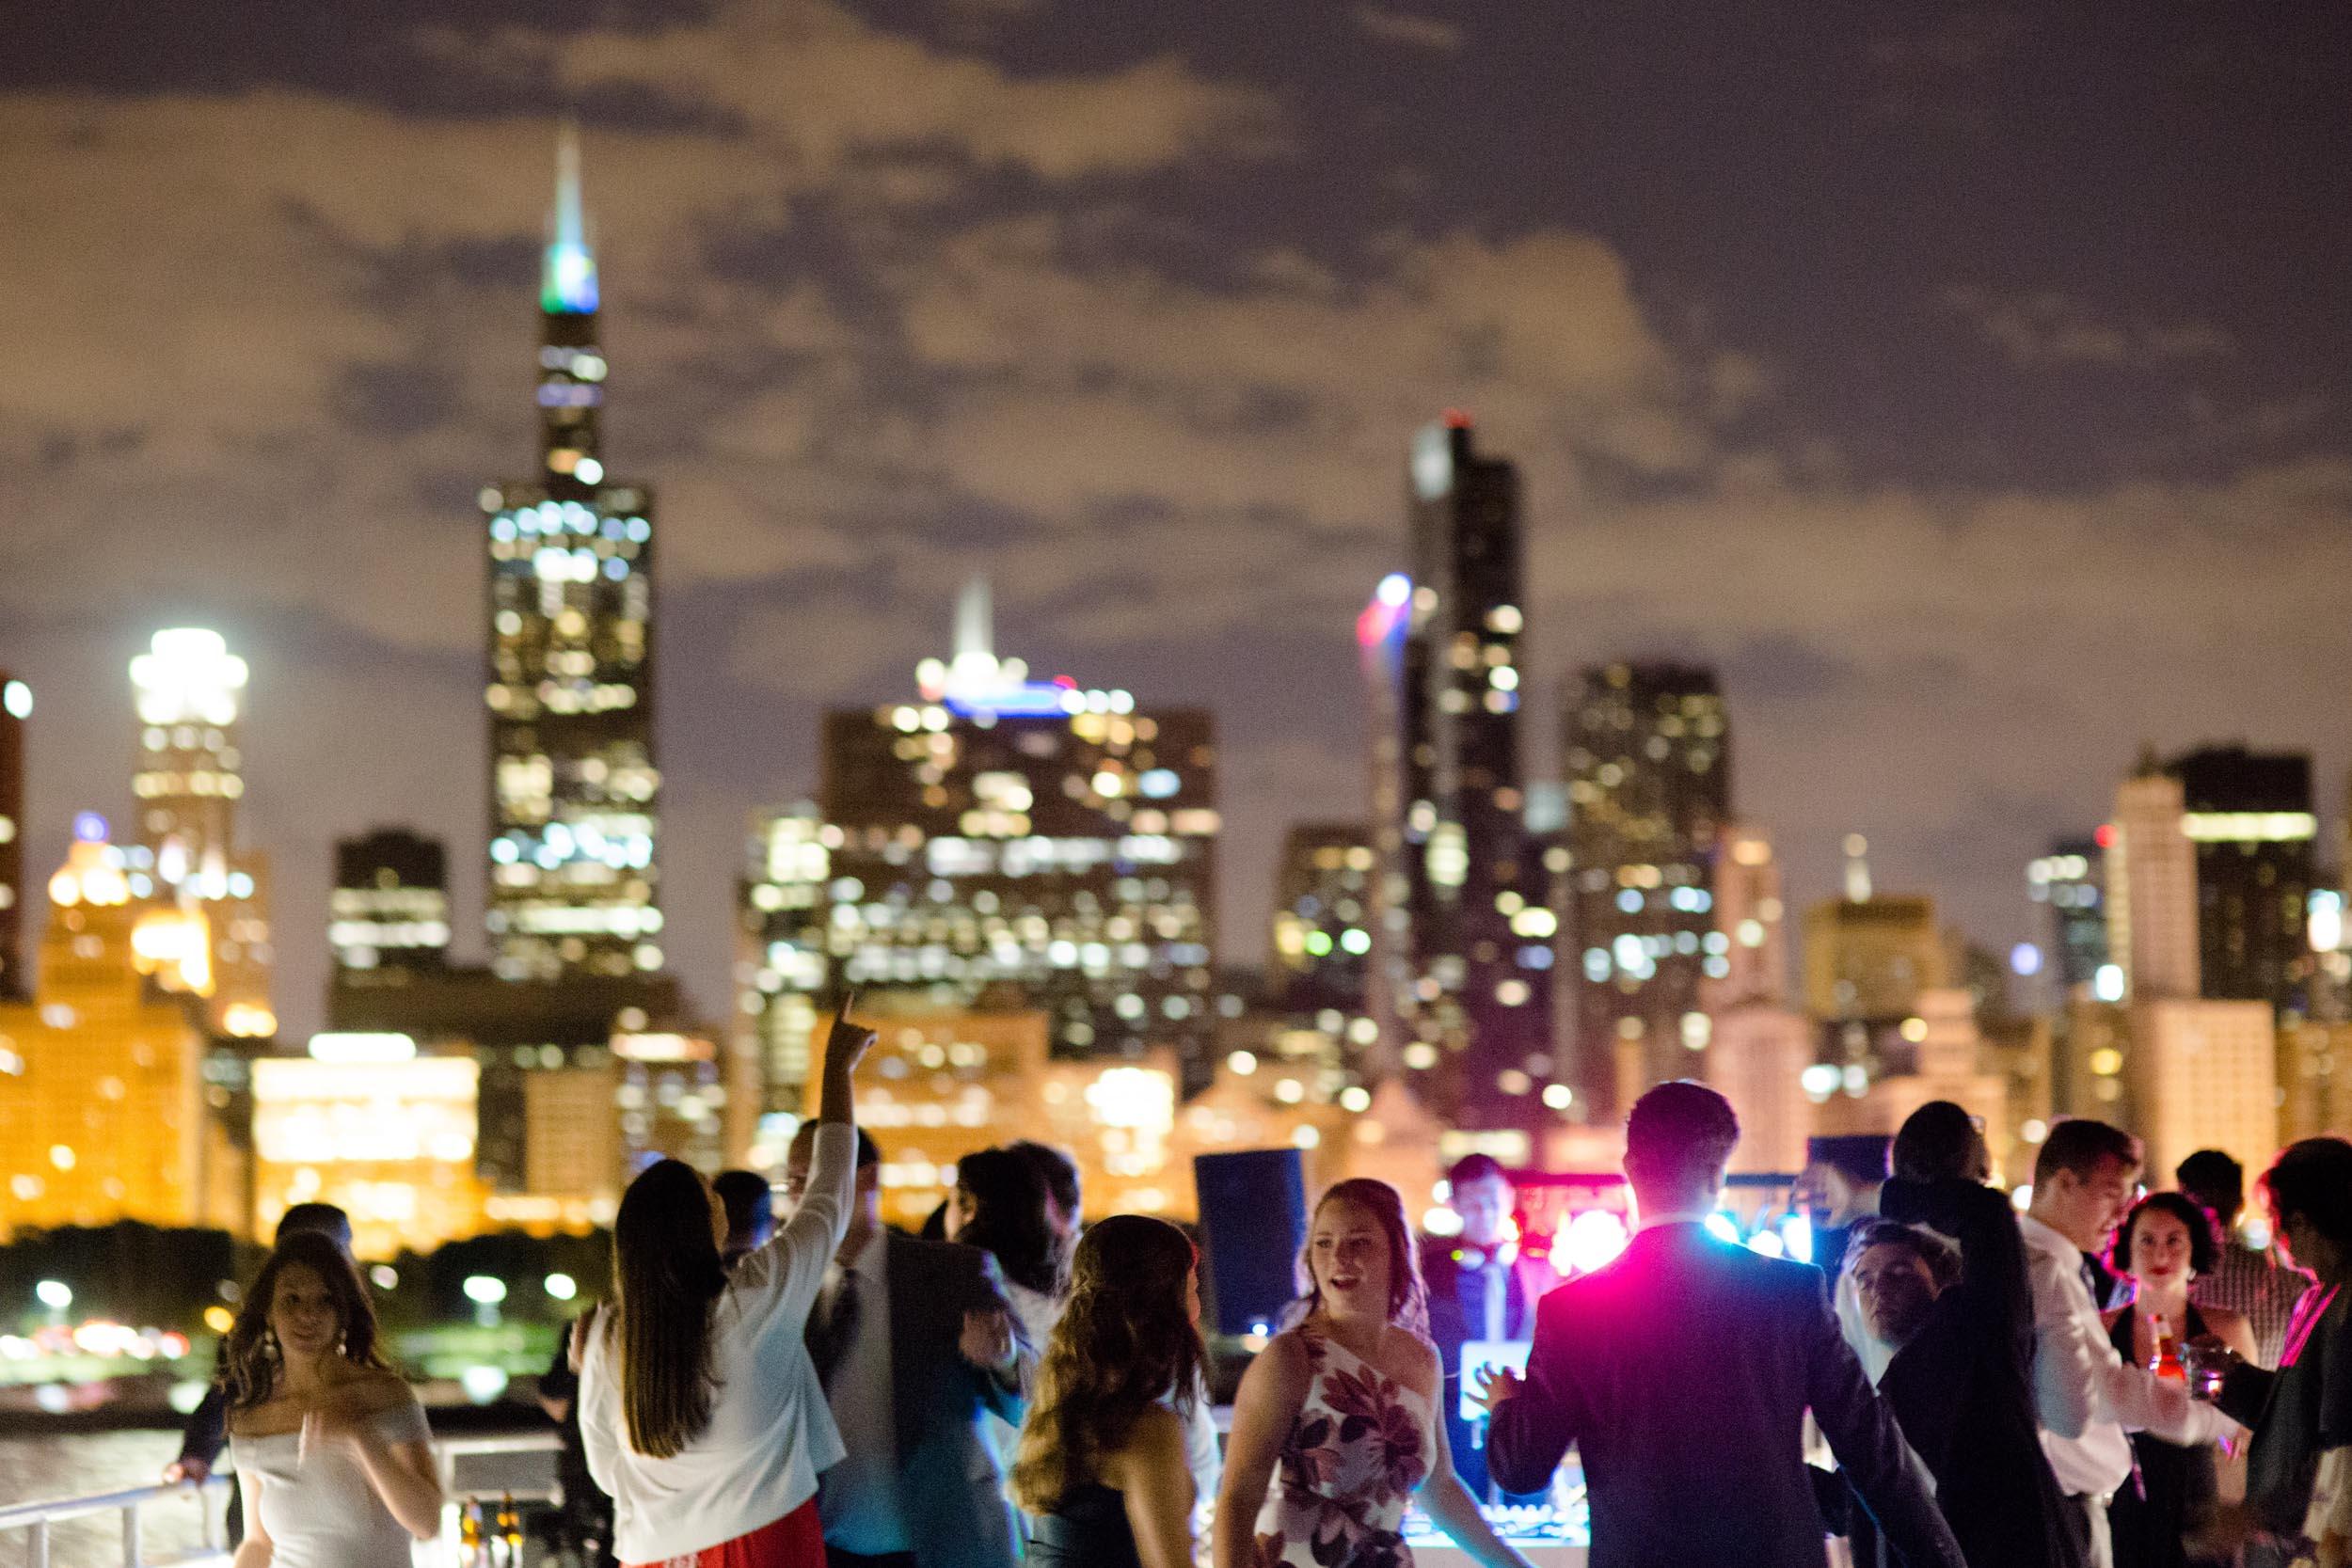 Wedding on Chicago's Fair Lady boat